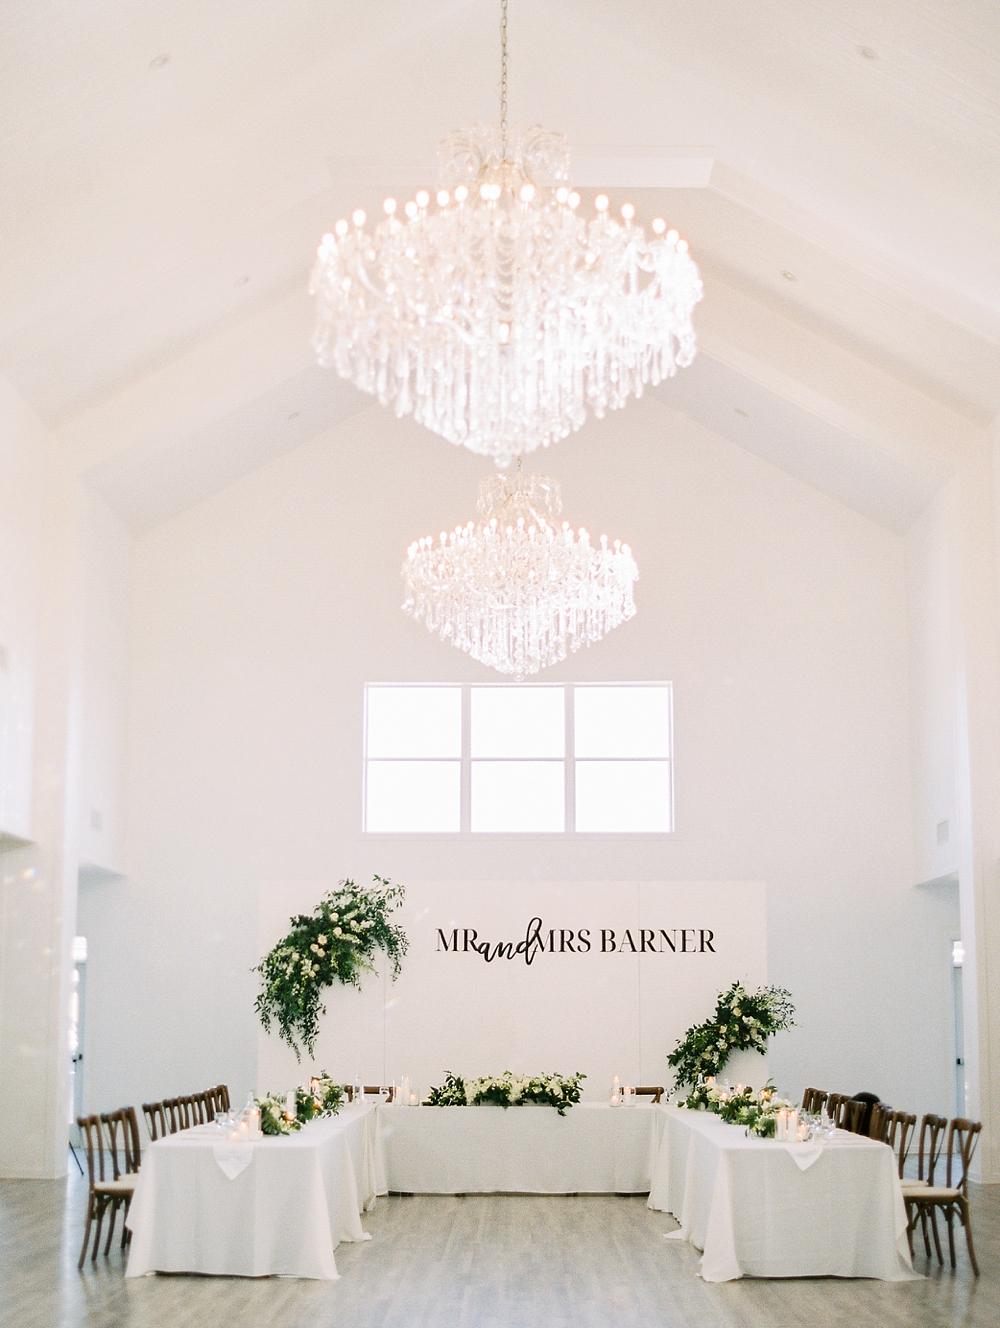 Kristin-La-Voie-Photography-austin-houston-texas-wedding-photographer-the-oaks-at-high-hill -4